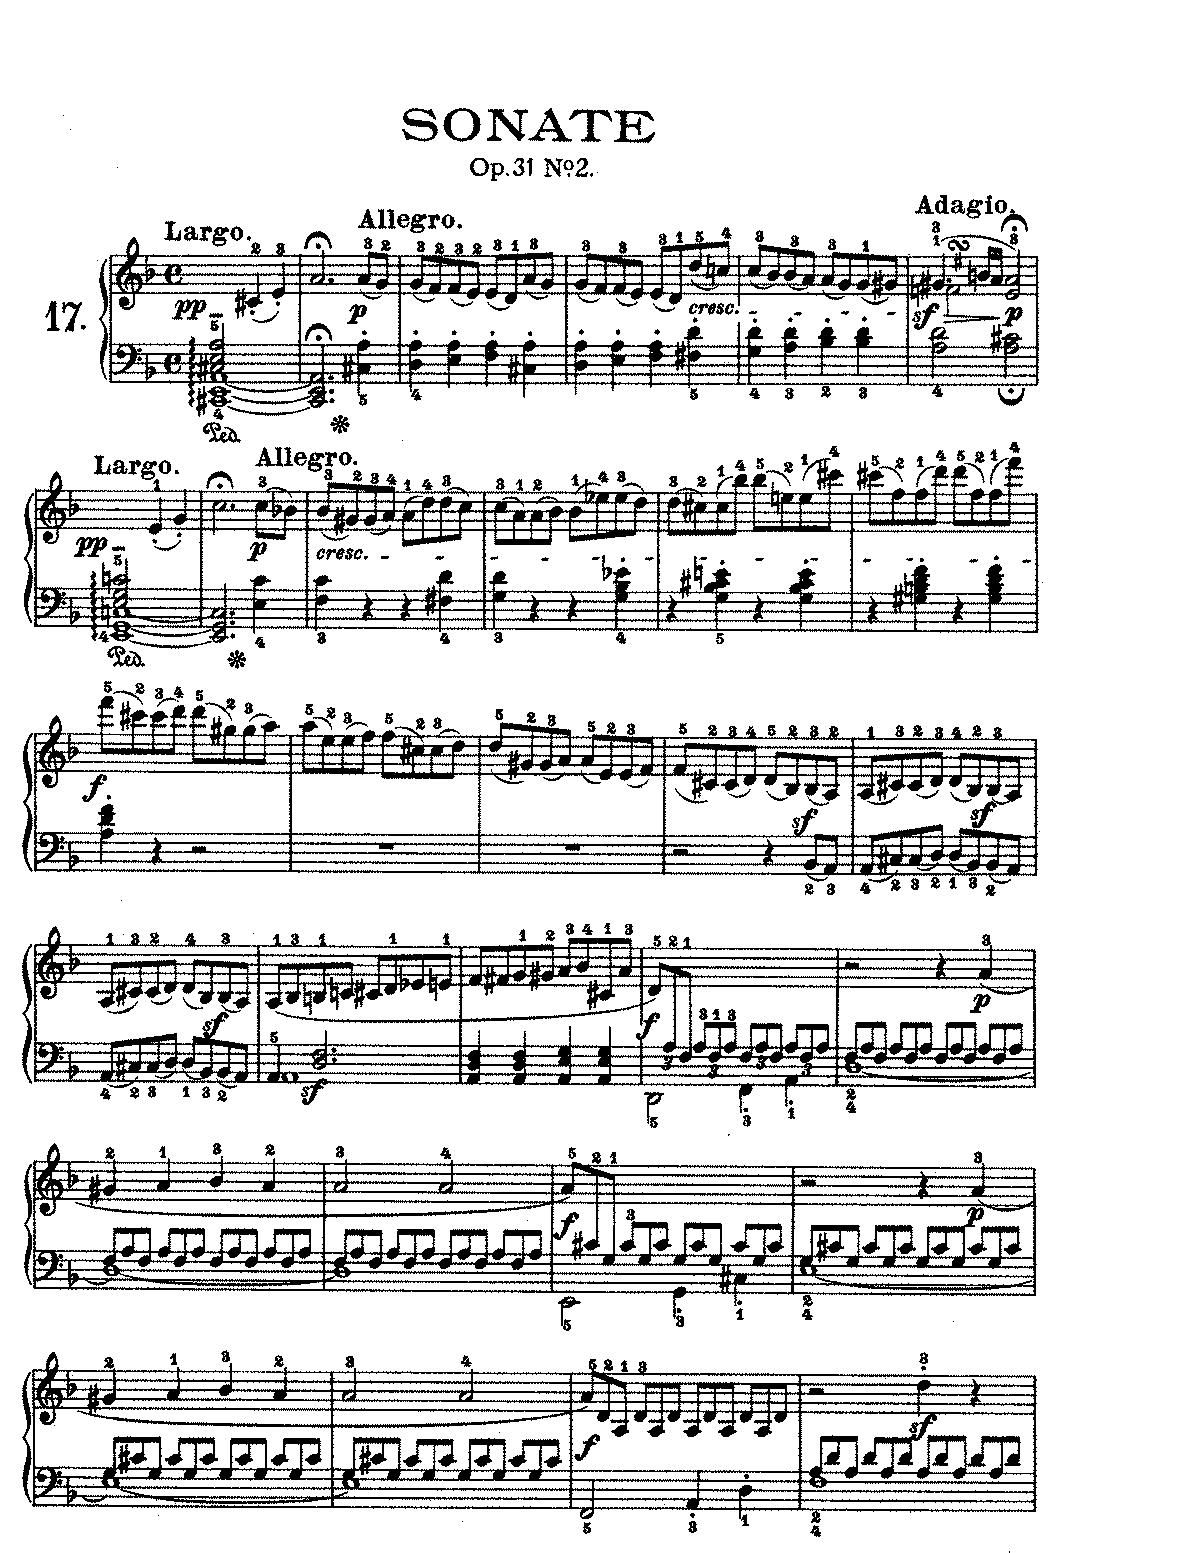 Beethoven Tempest Sonata 3rd Movement Pdf Reader - linoarebel